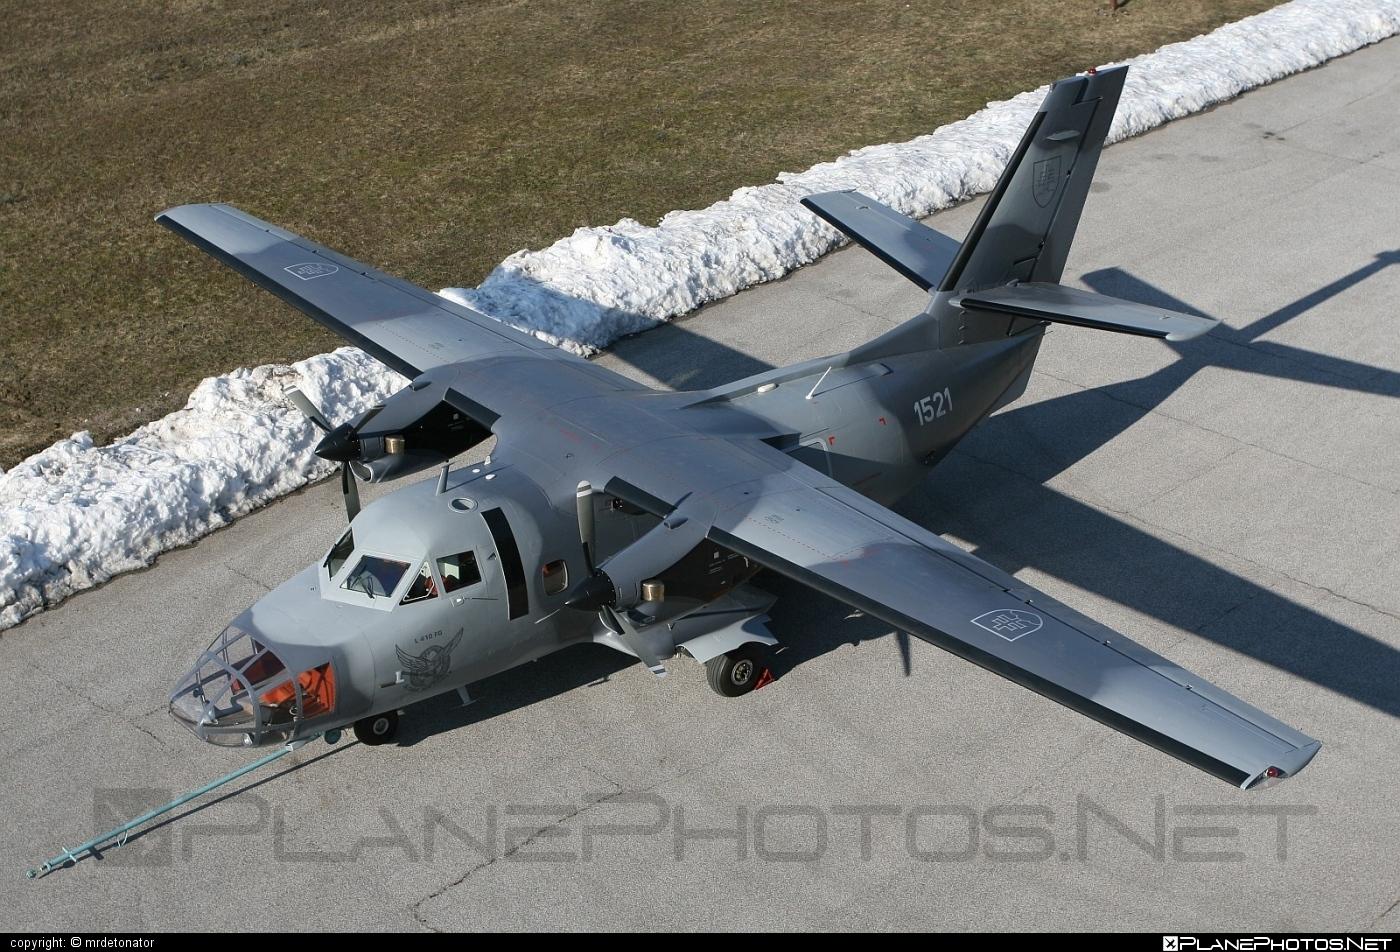 Let L-410FG Turbolet - 1521 operated by Vzdušné sily OS SR (Slovak Air Force) #let #slovakairforce #vzdusnesilyossr